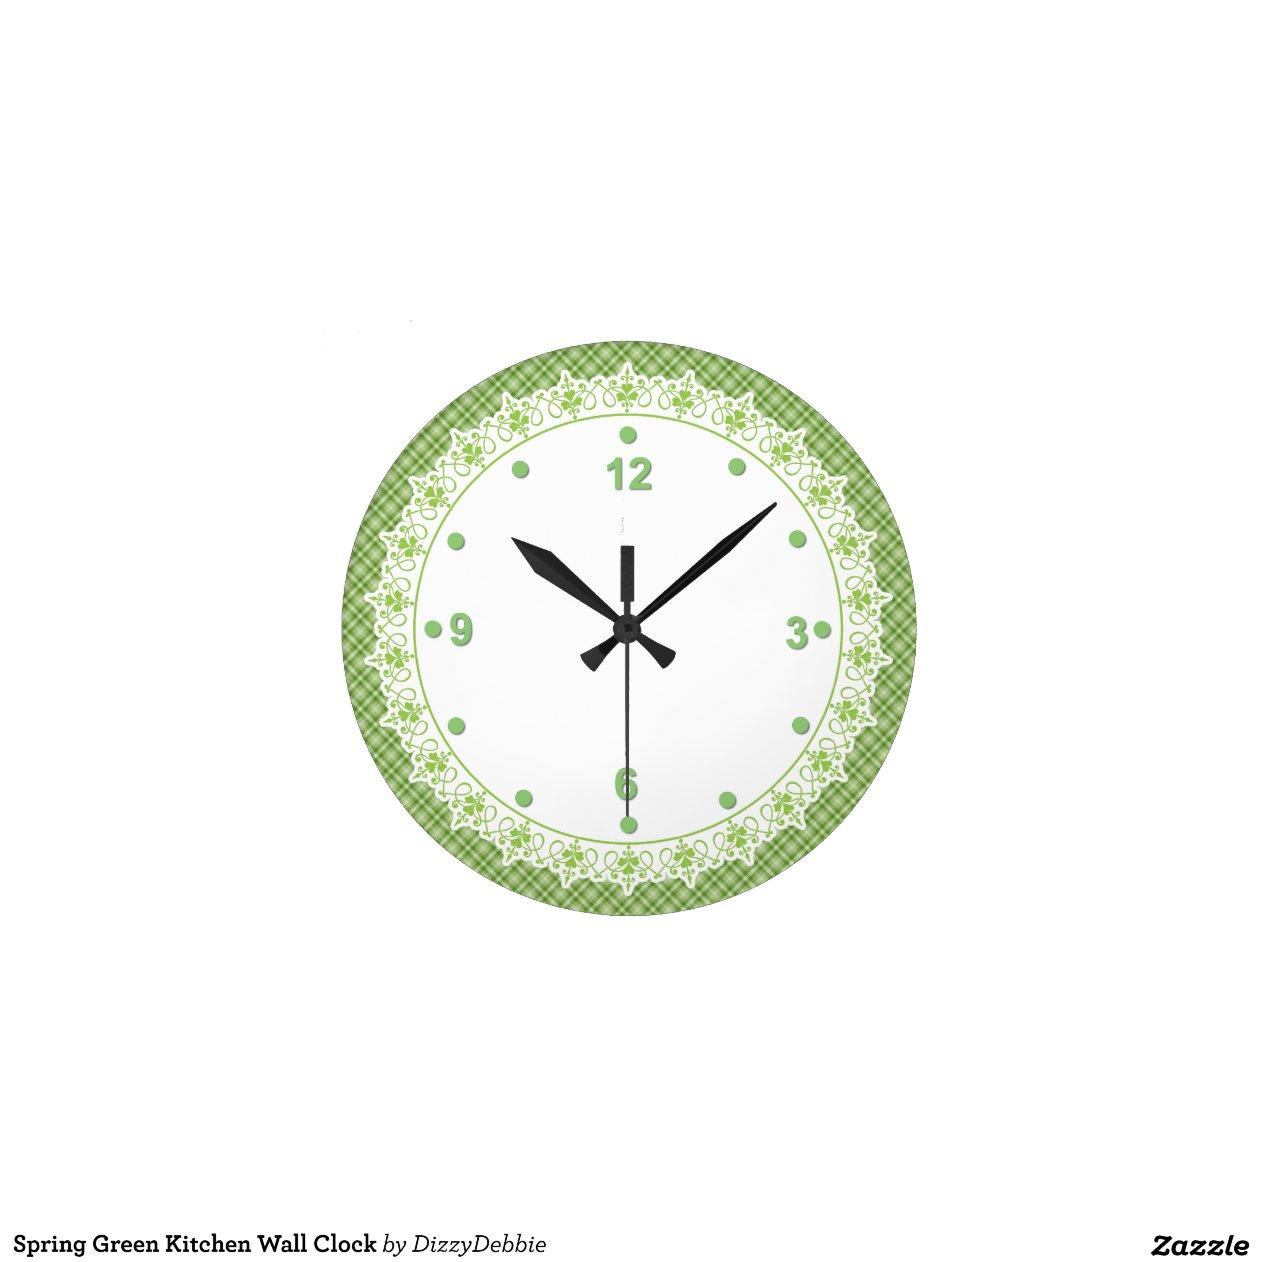 Reloj de pared verde de la cocina de la primavera zazzle - Reloj de pared diseno ...